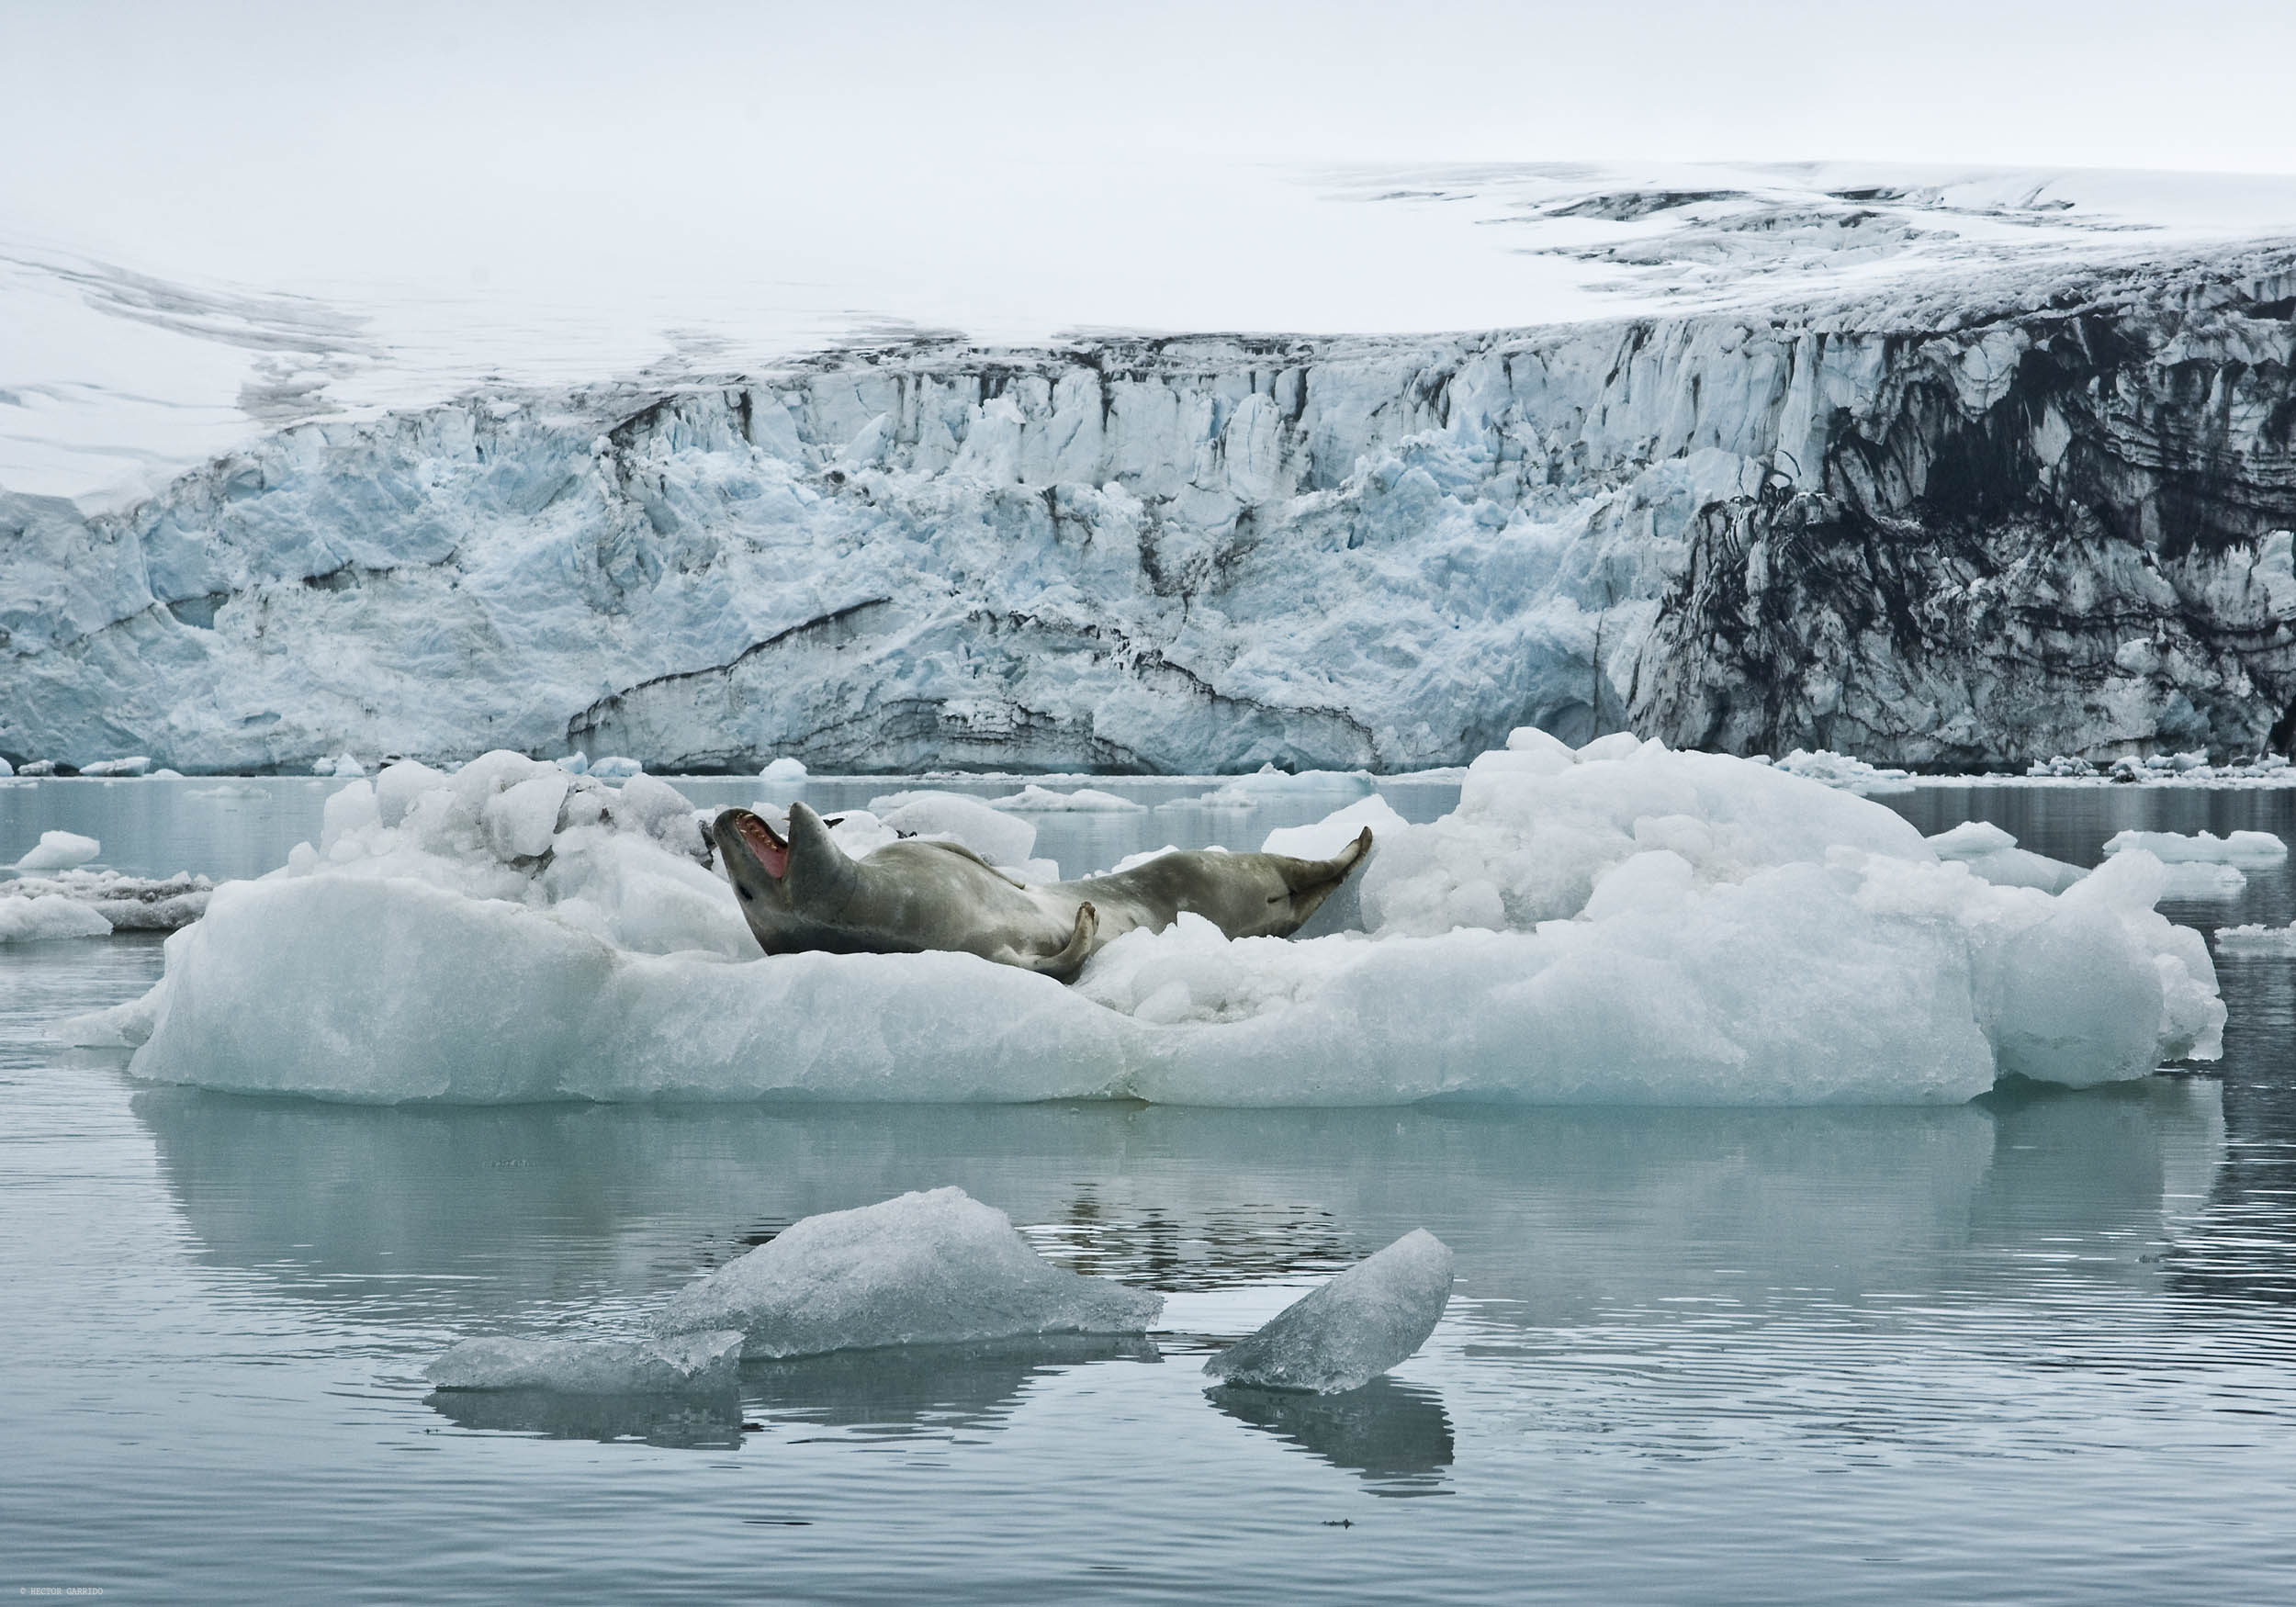 Foca leopardo, Antártida - Gaia - Hector Garrido, Aerial and human photography